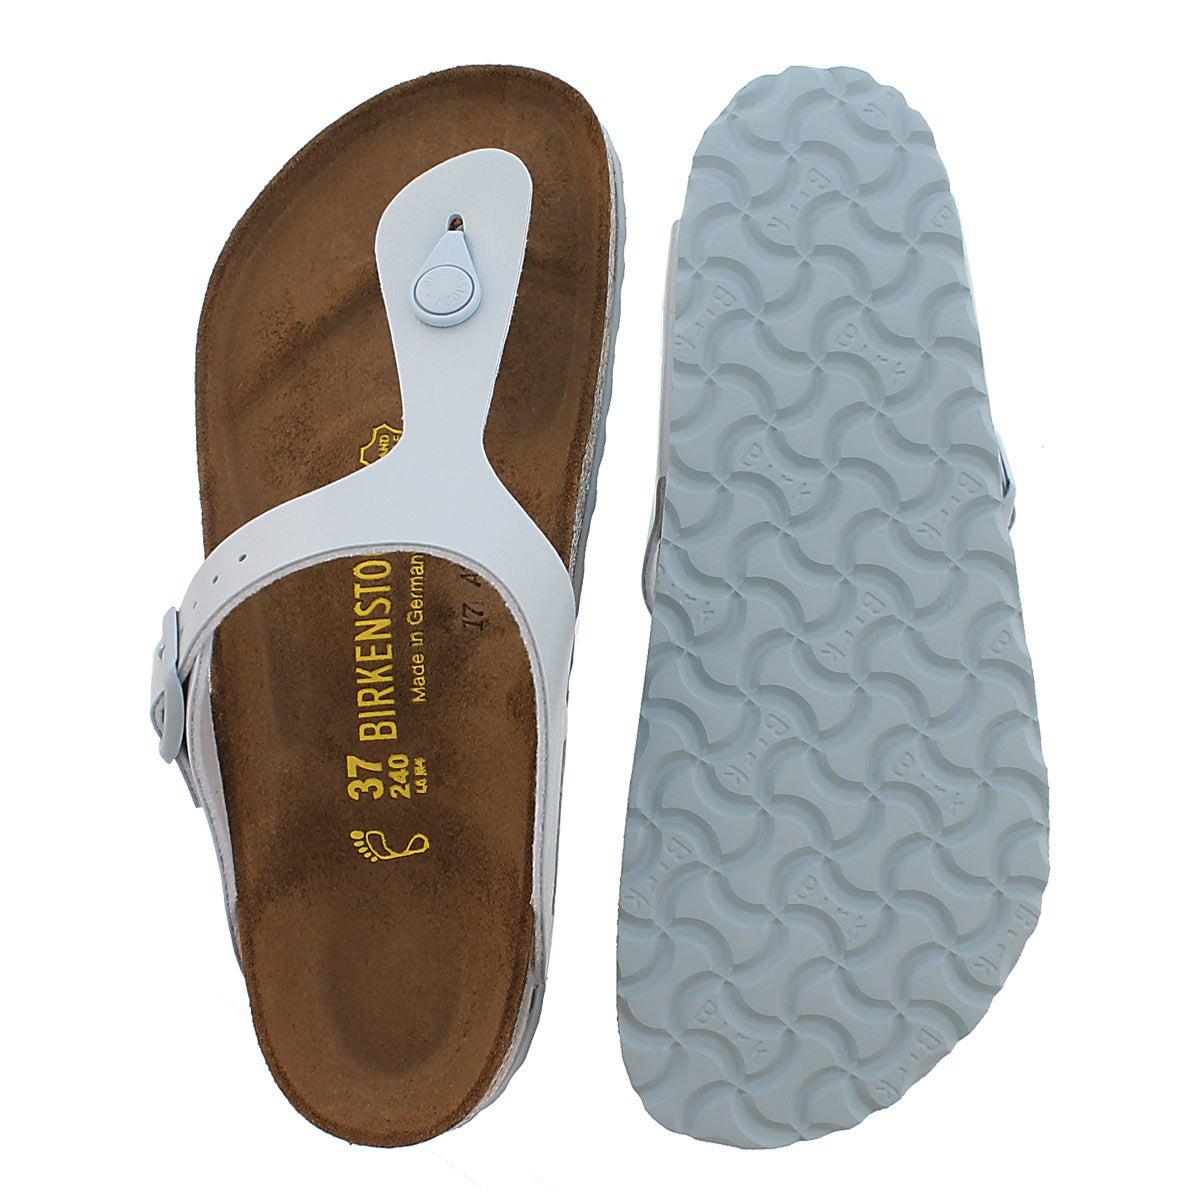 Lds Gizeh baby blue thong sandal